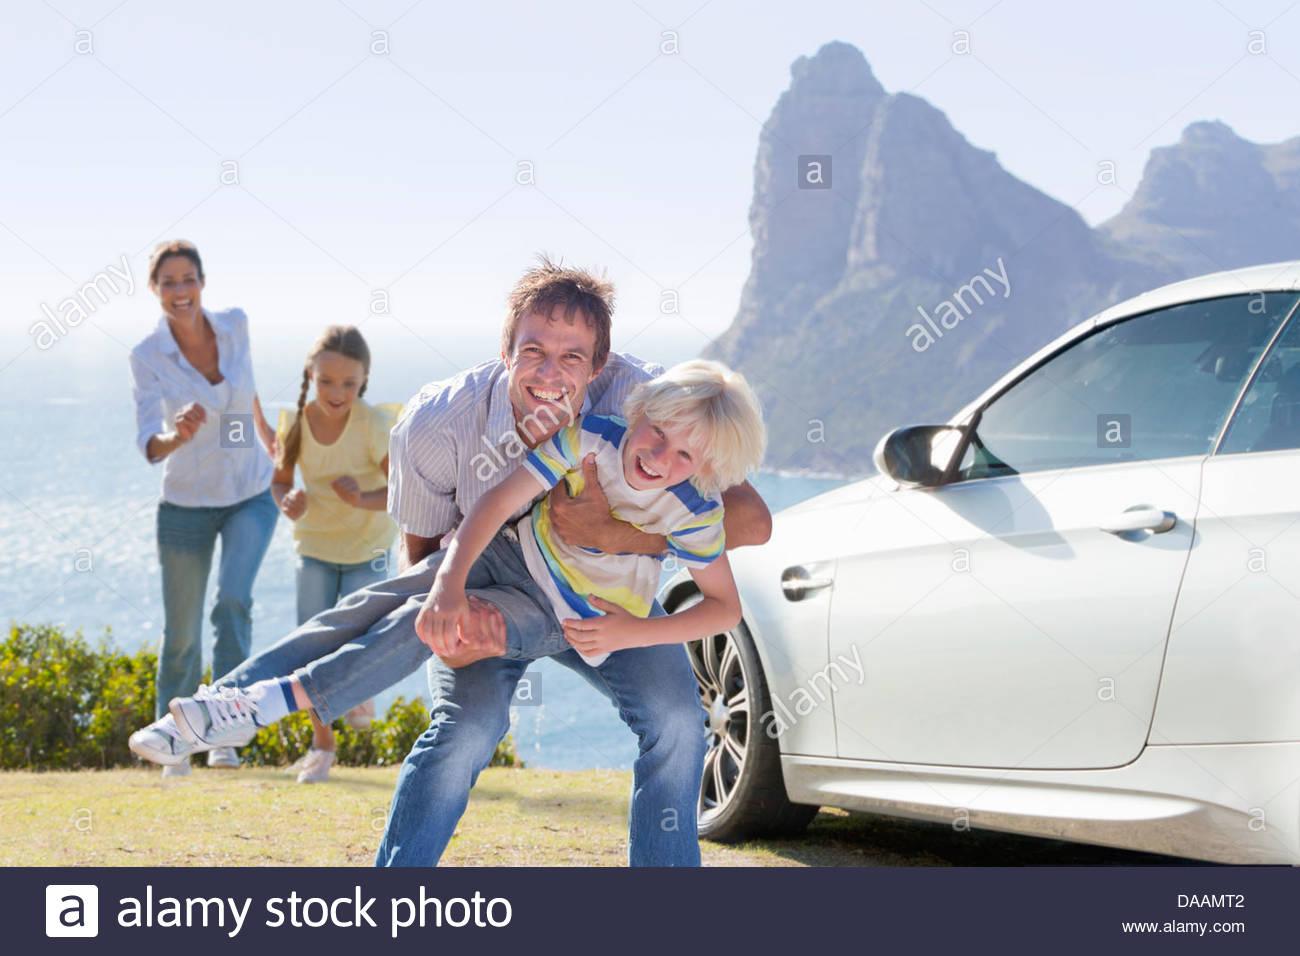 Retrato de familia lúdica fuera de coche cerca del mar Imagen De Stock